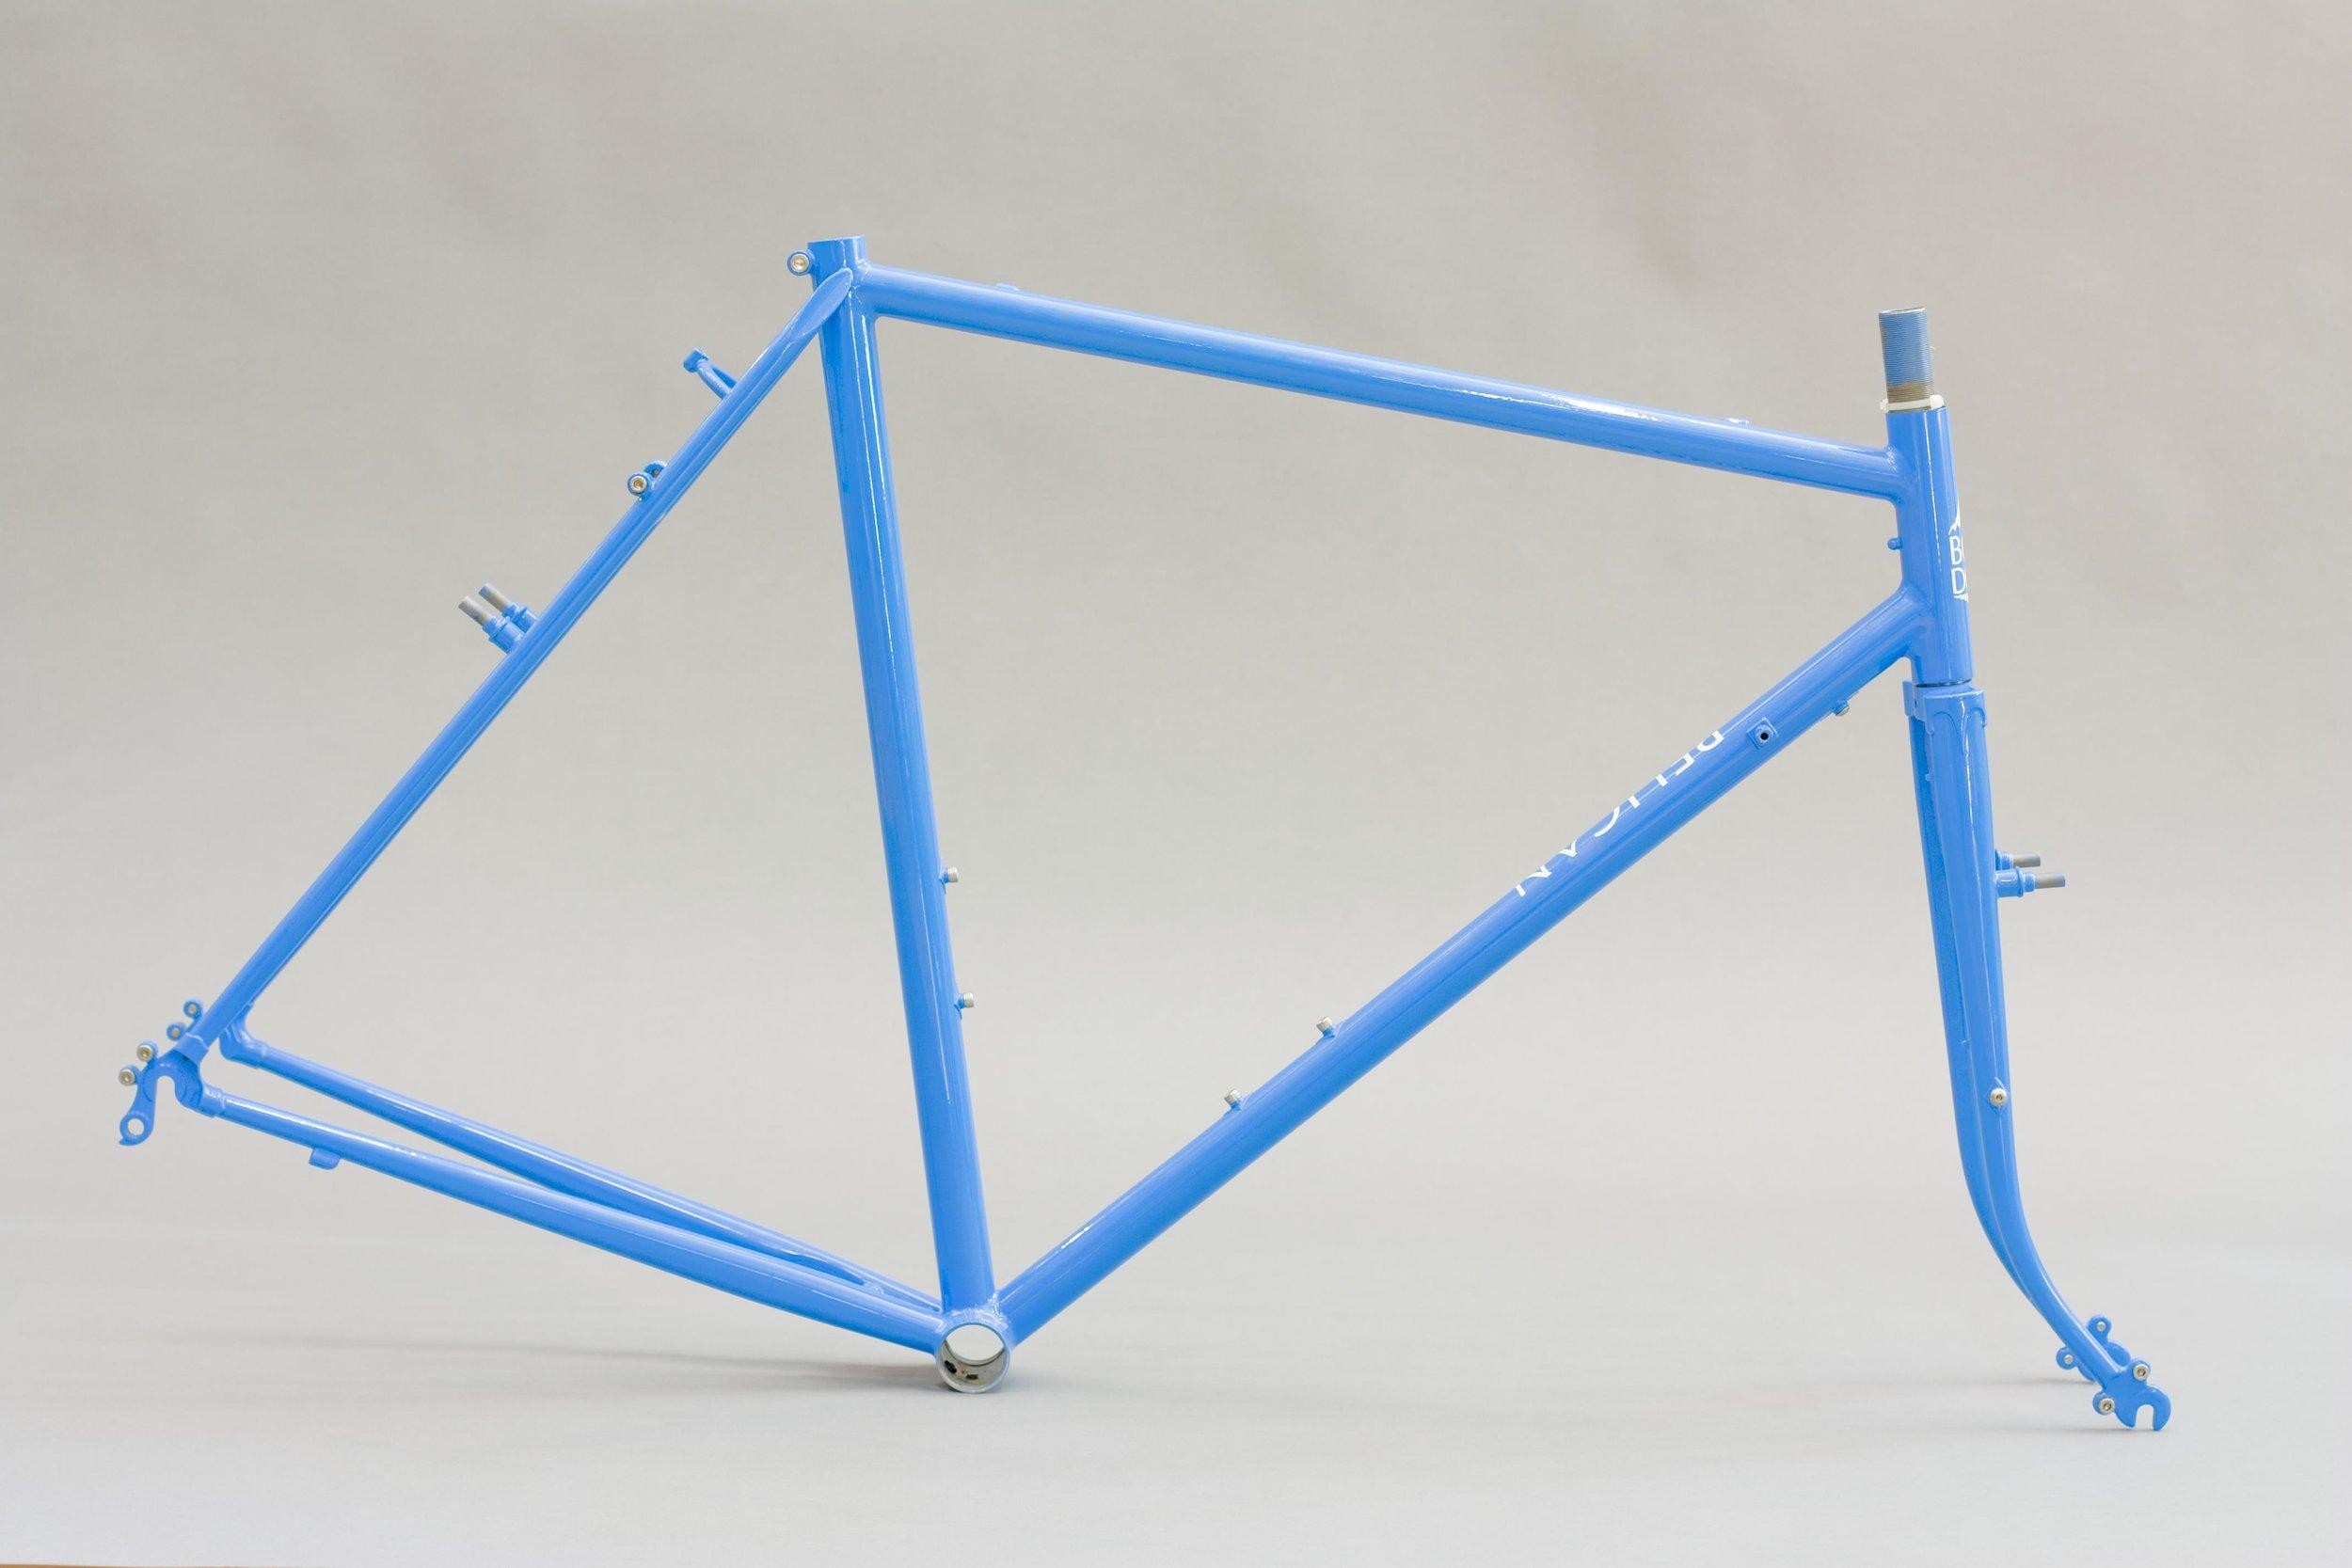 56cm-winter-bicycles-built-pelican_8269730617_o.jpg